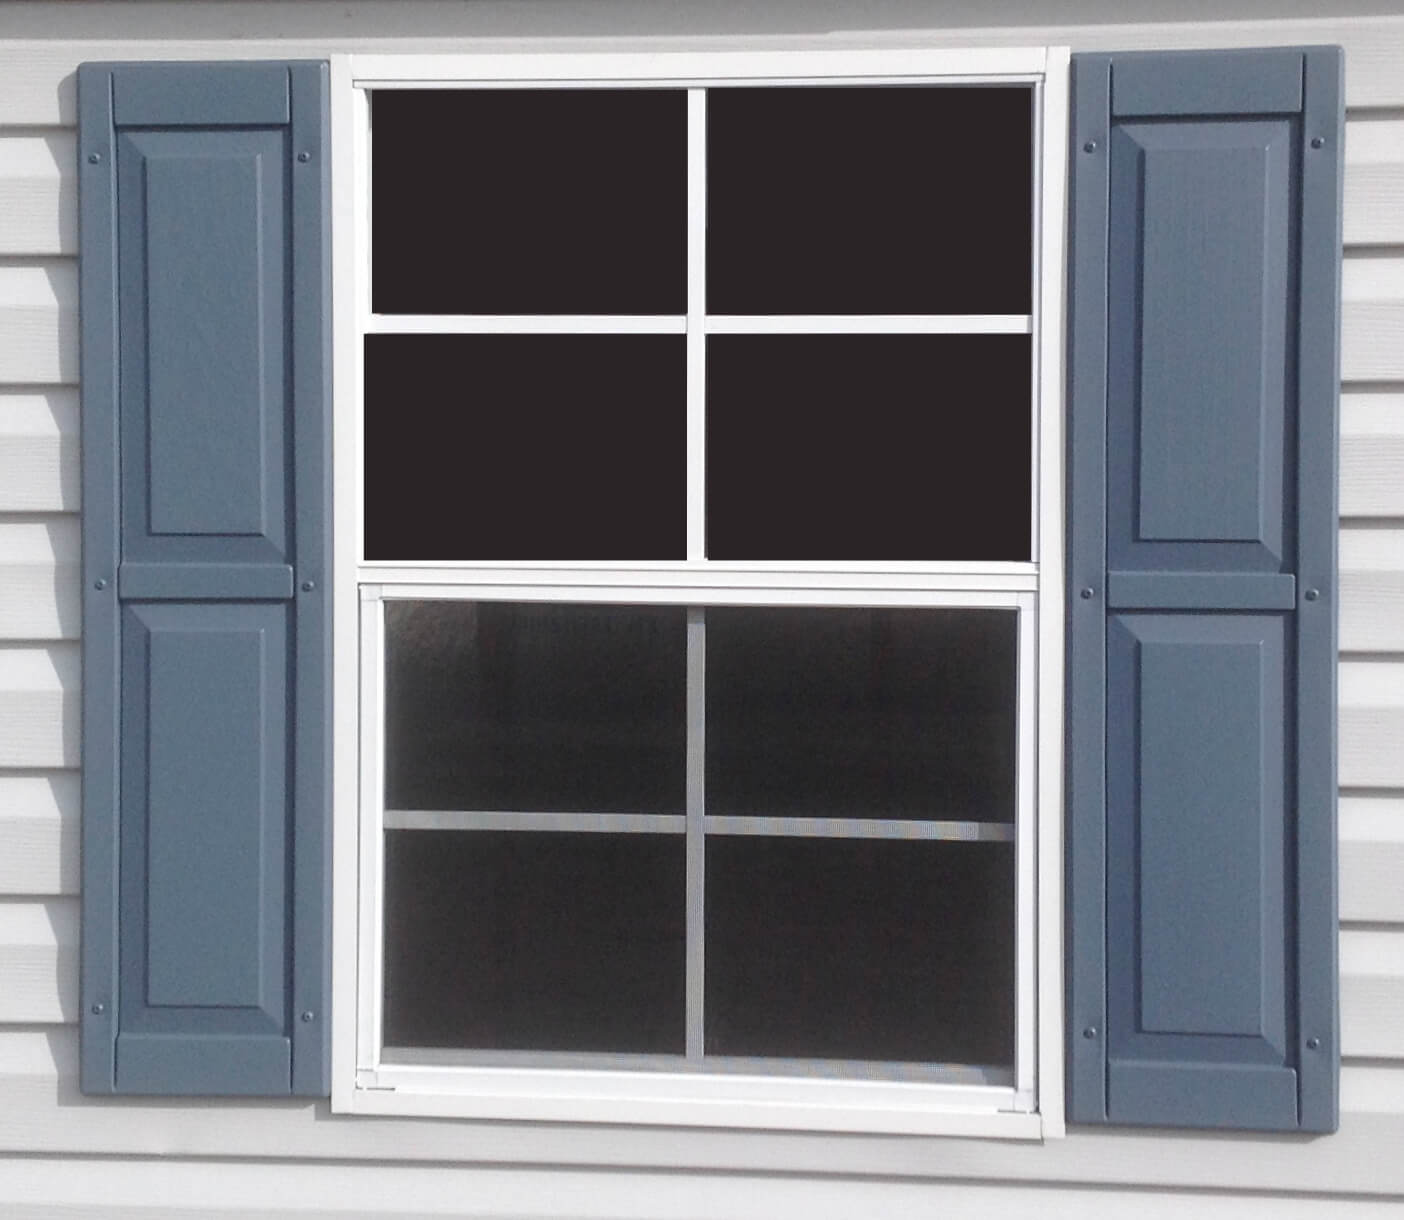 24x36 Window $100 Raised Panel Shutters $50 per pair